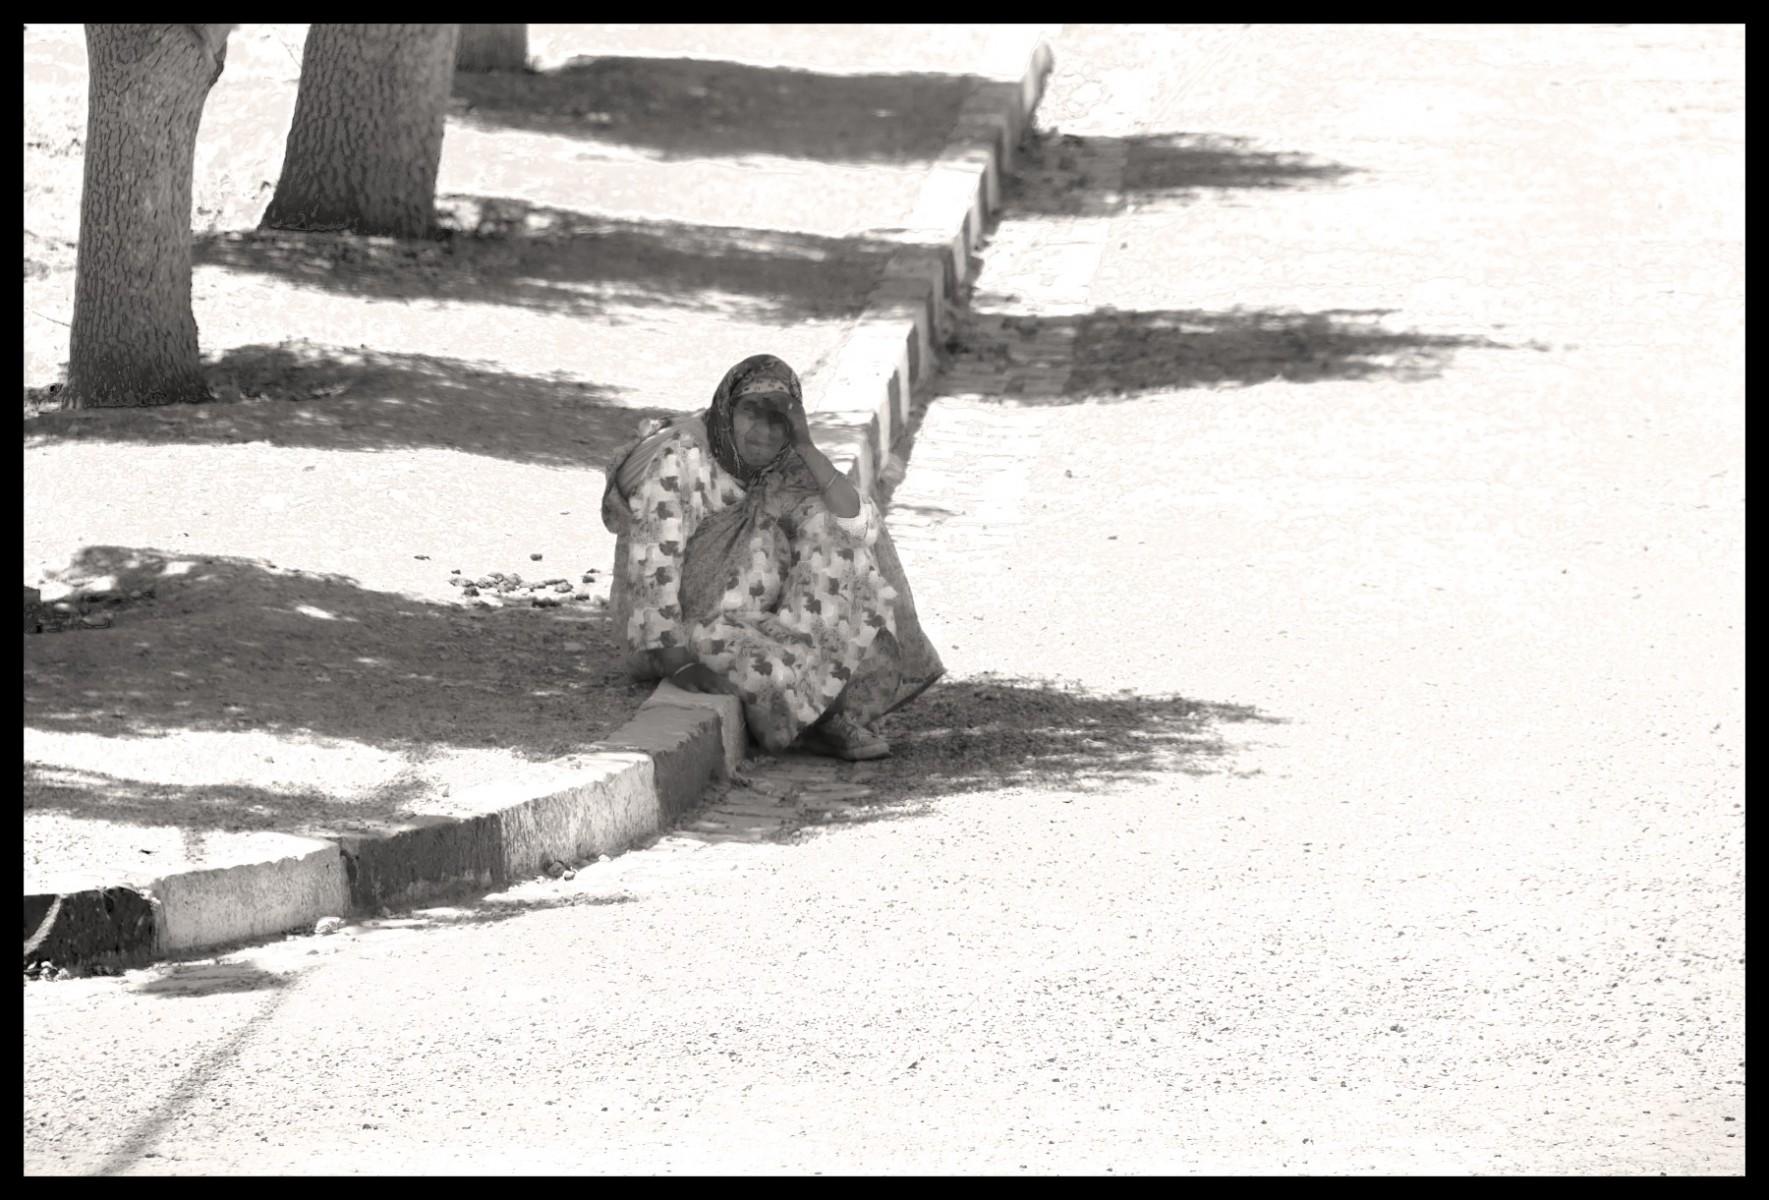 98317_DSC0056-shadow Storie di Luce